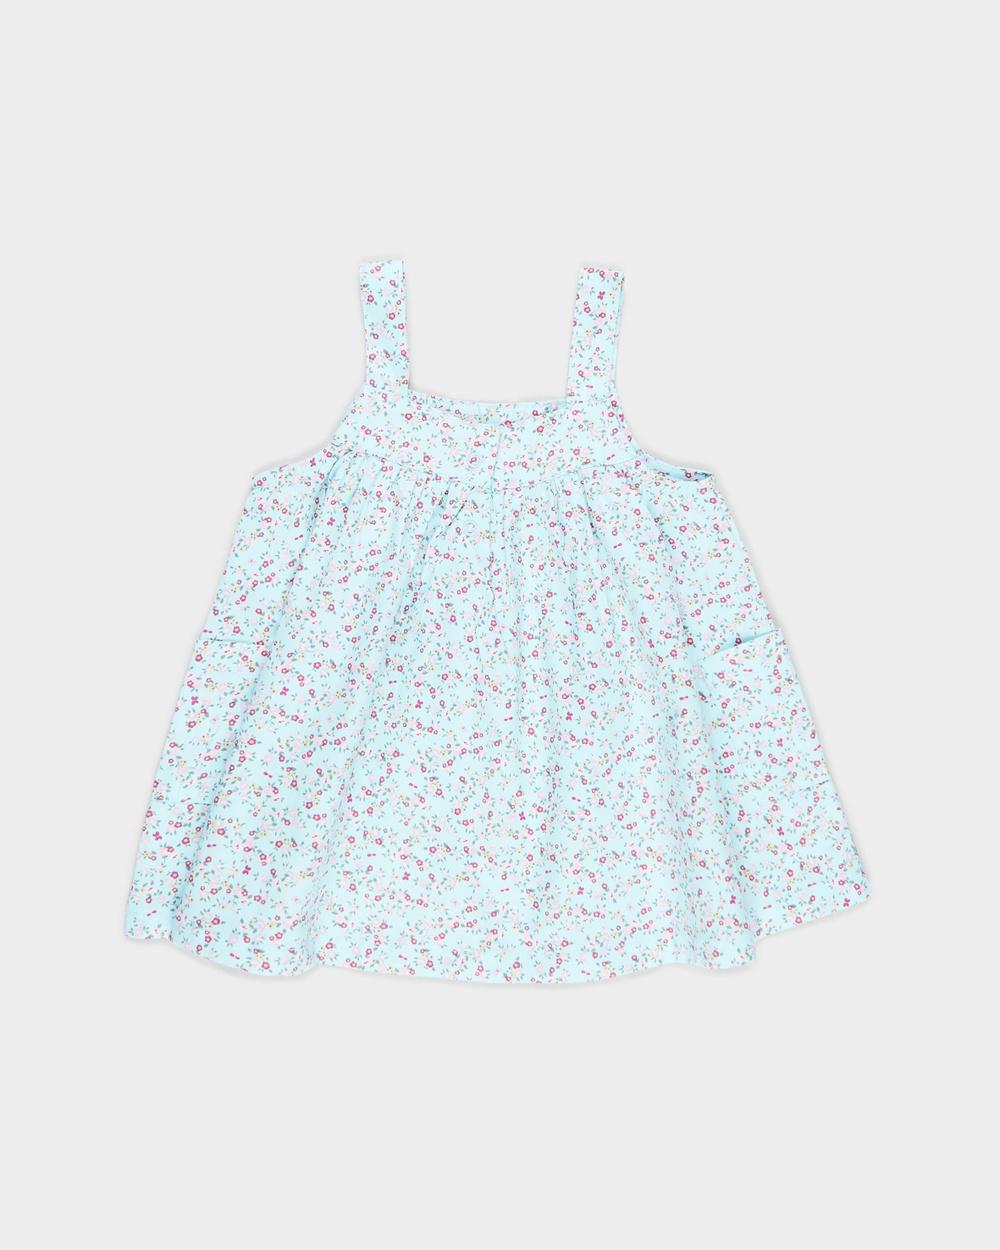 Cotton On Baby Penny Pinafore Dress Babies Dresses Dream Blue Fuschia Pop & Somerset Floral Australia